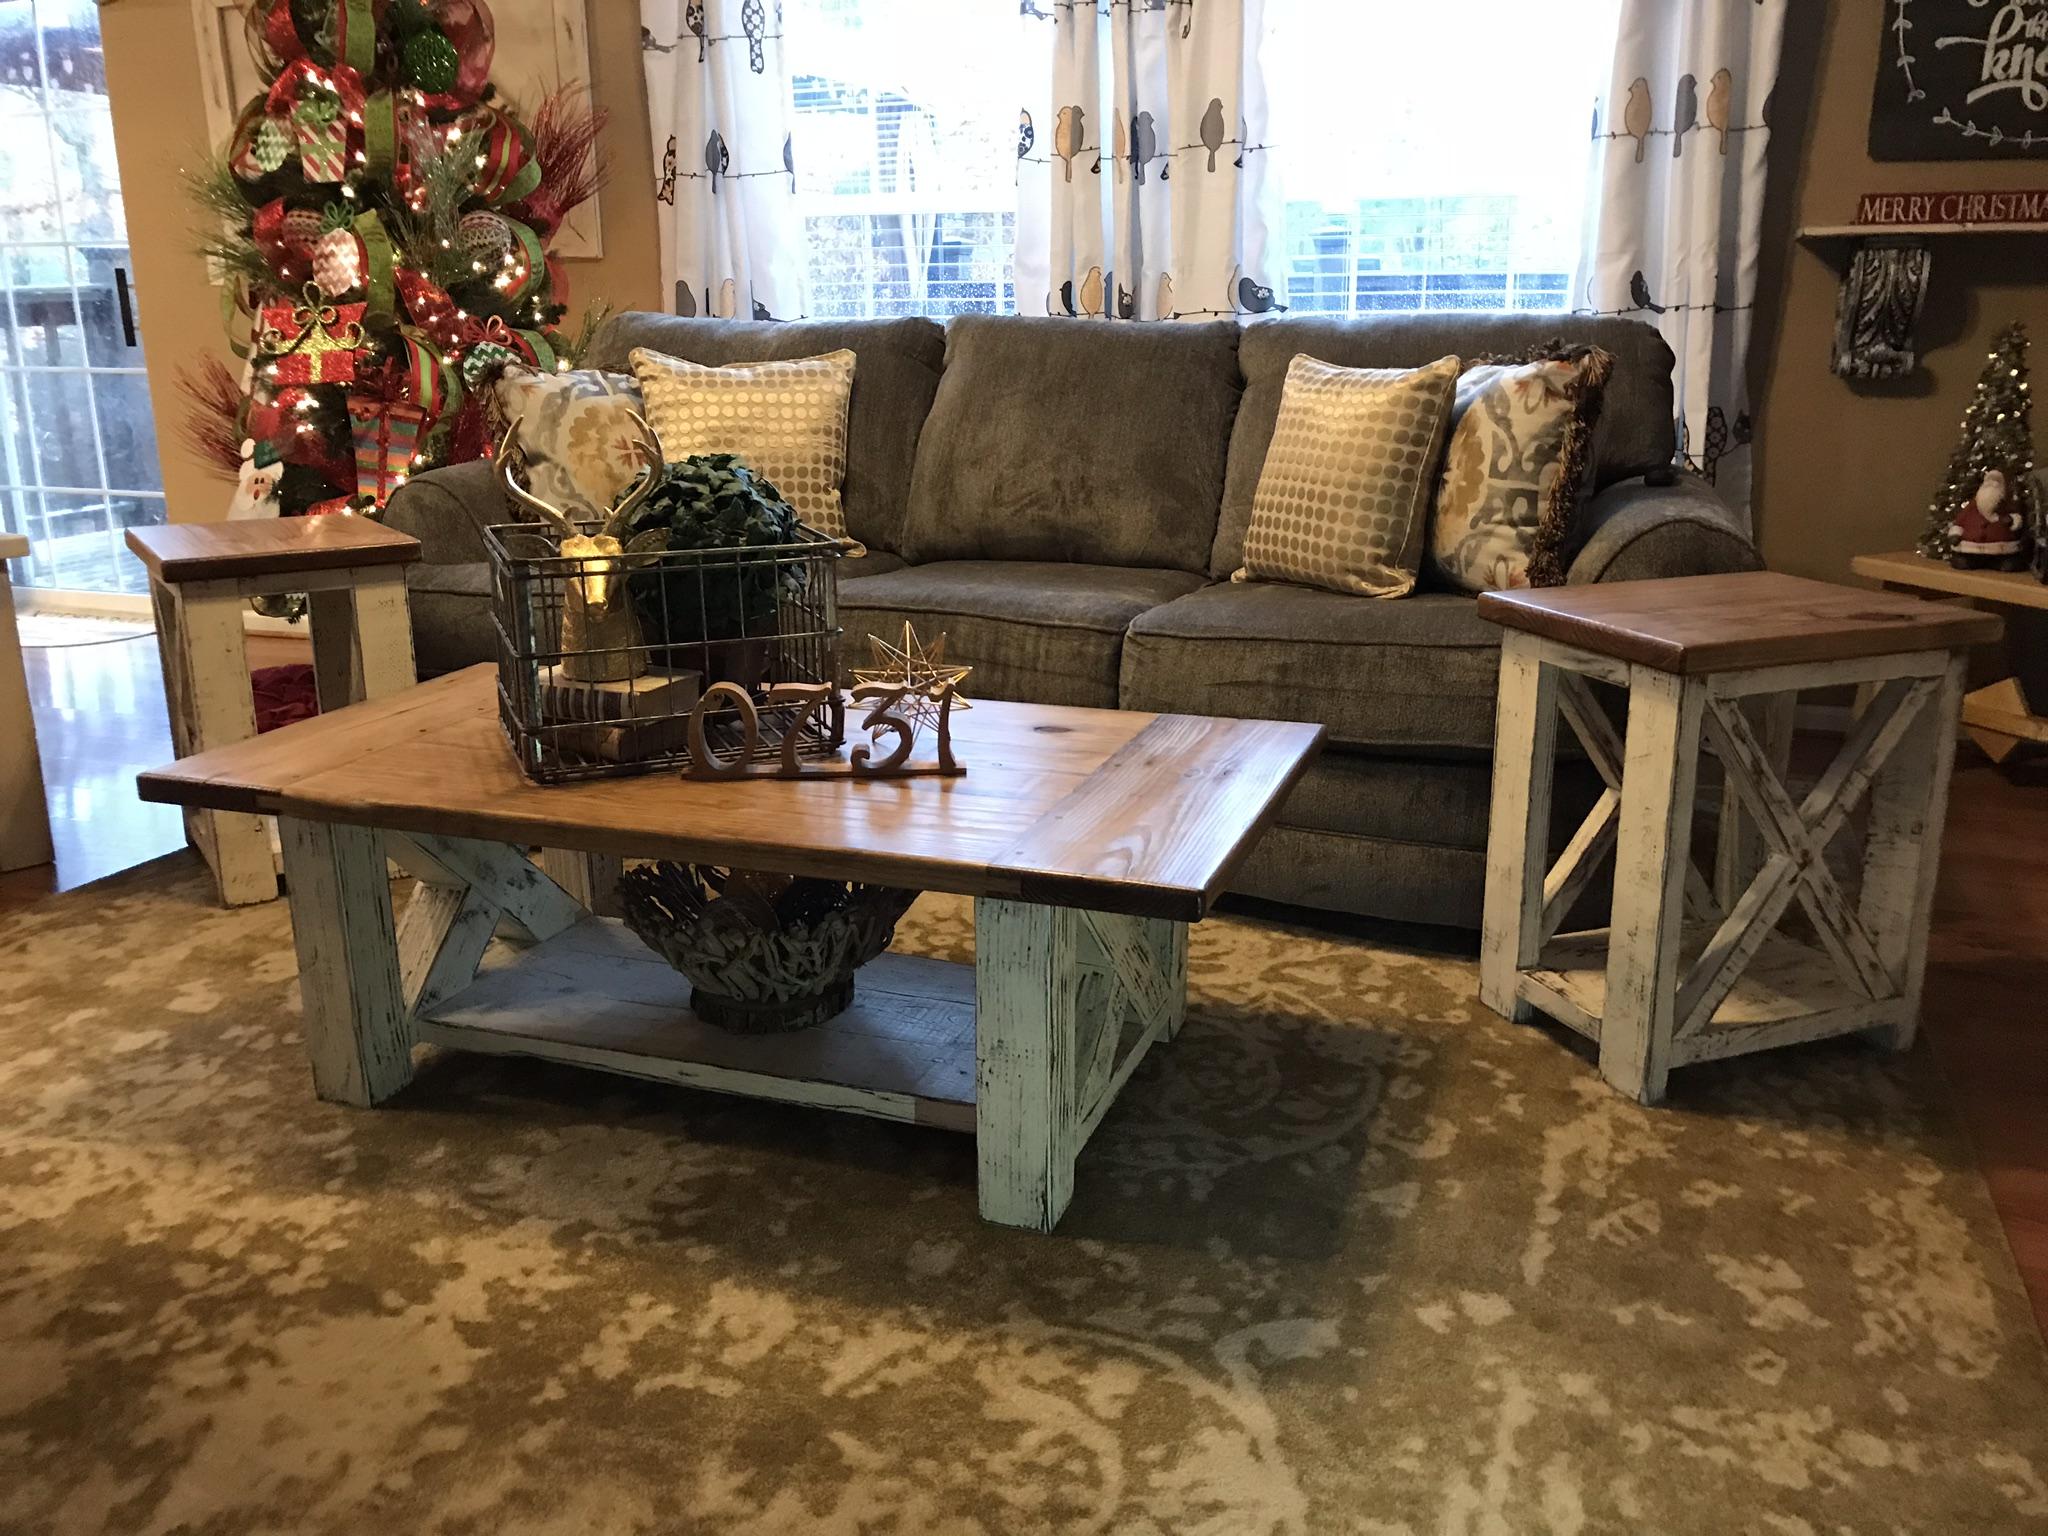 Chunky Farmhouse Coffee Table and End Tables